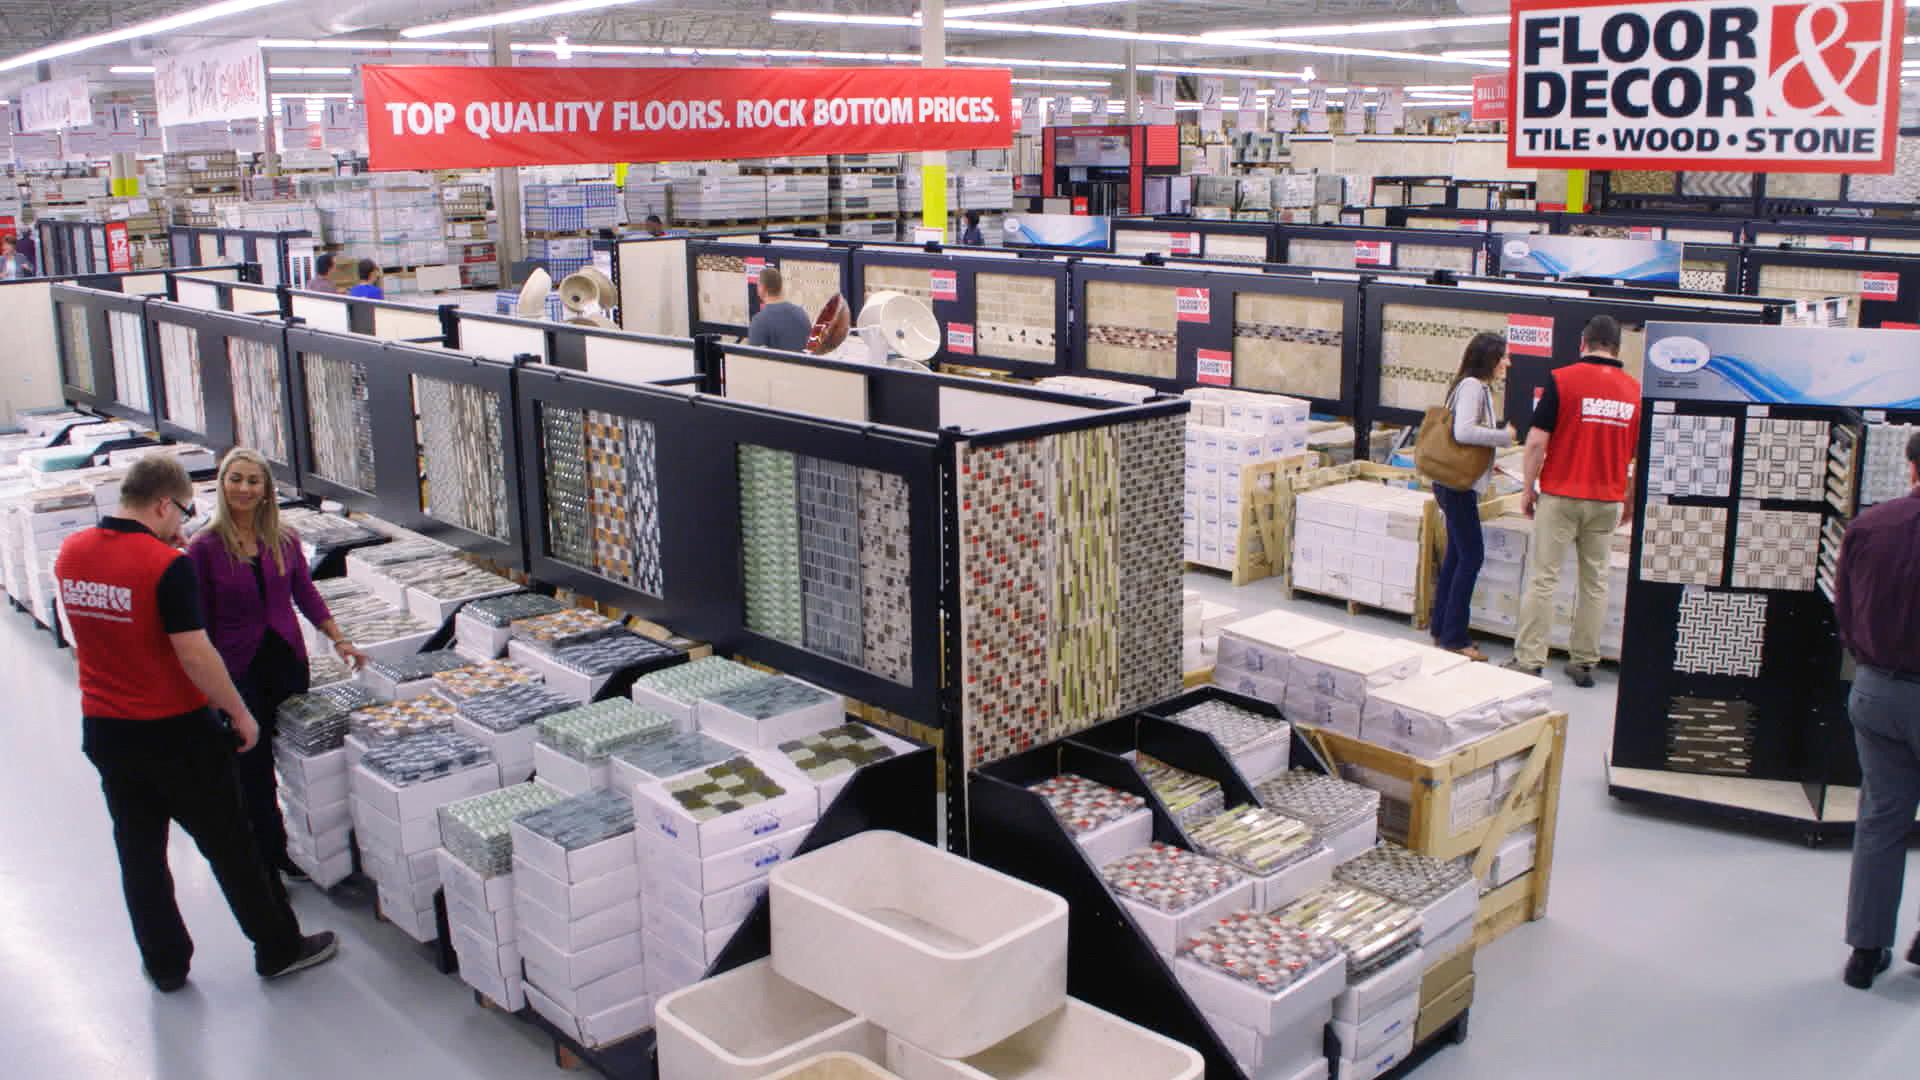 floor amp decor smyrna georgia tile manufacturers